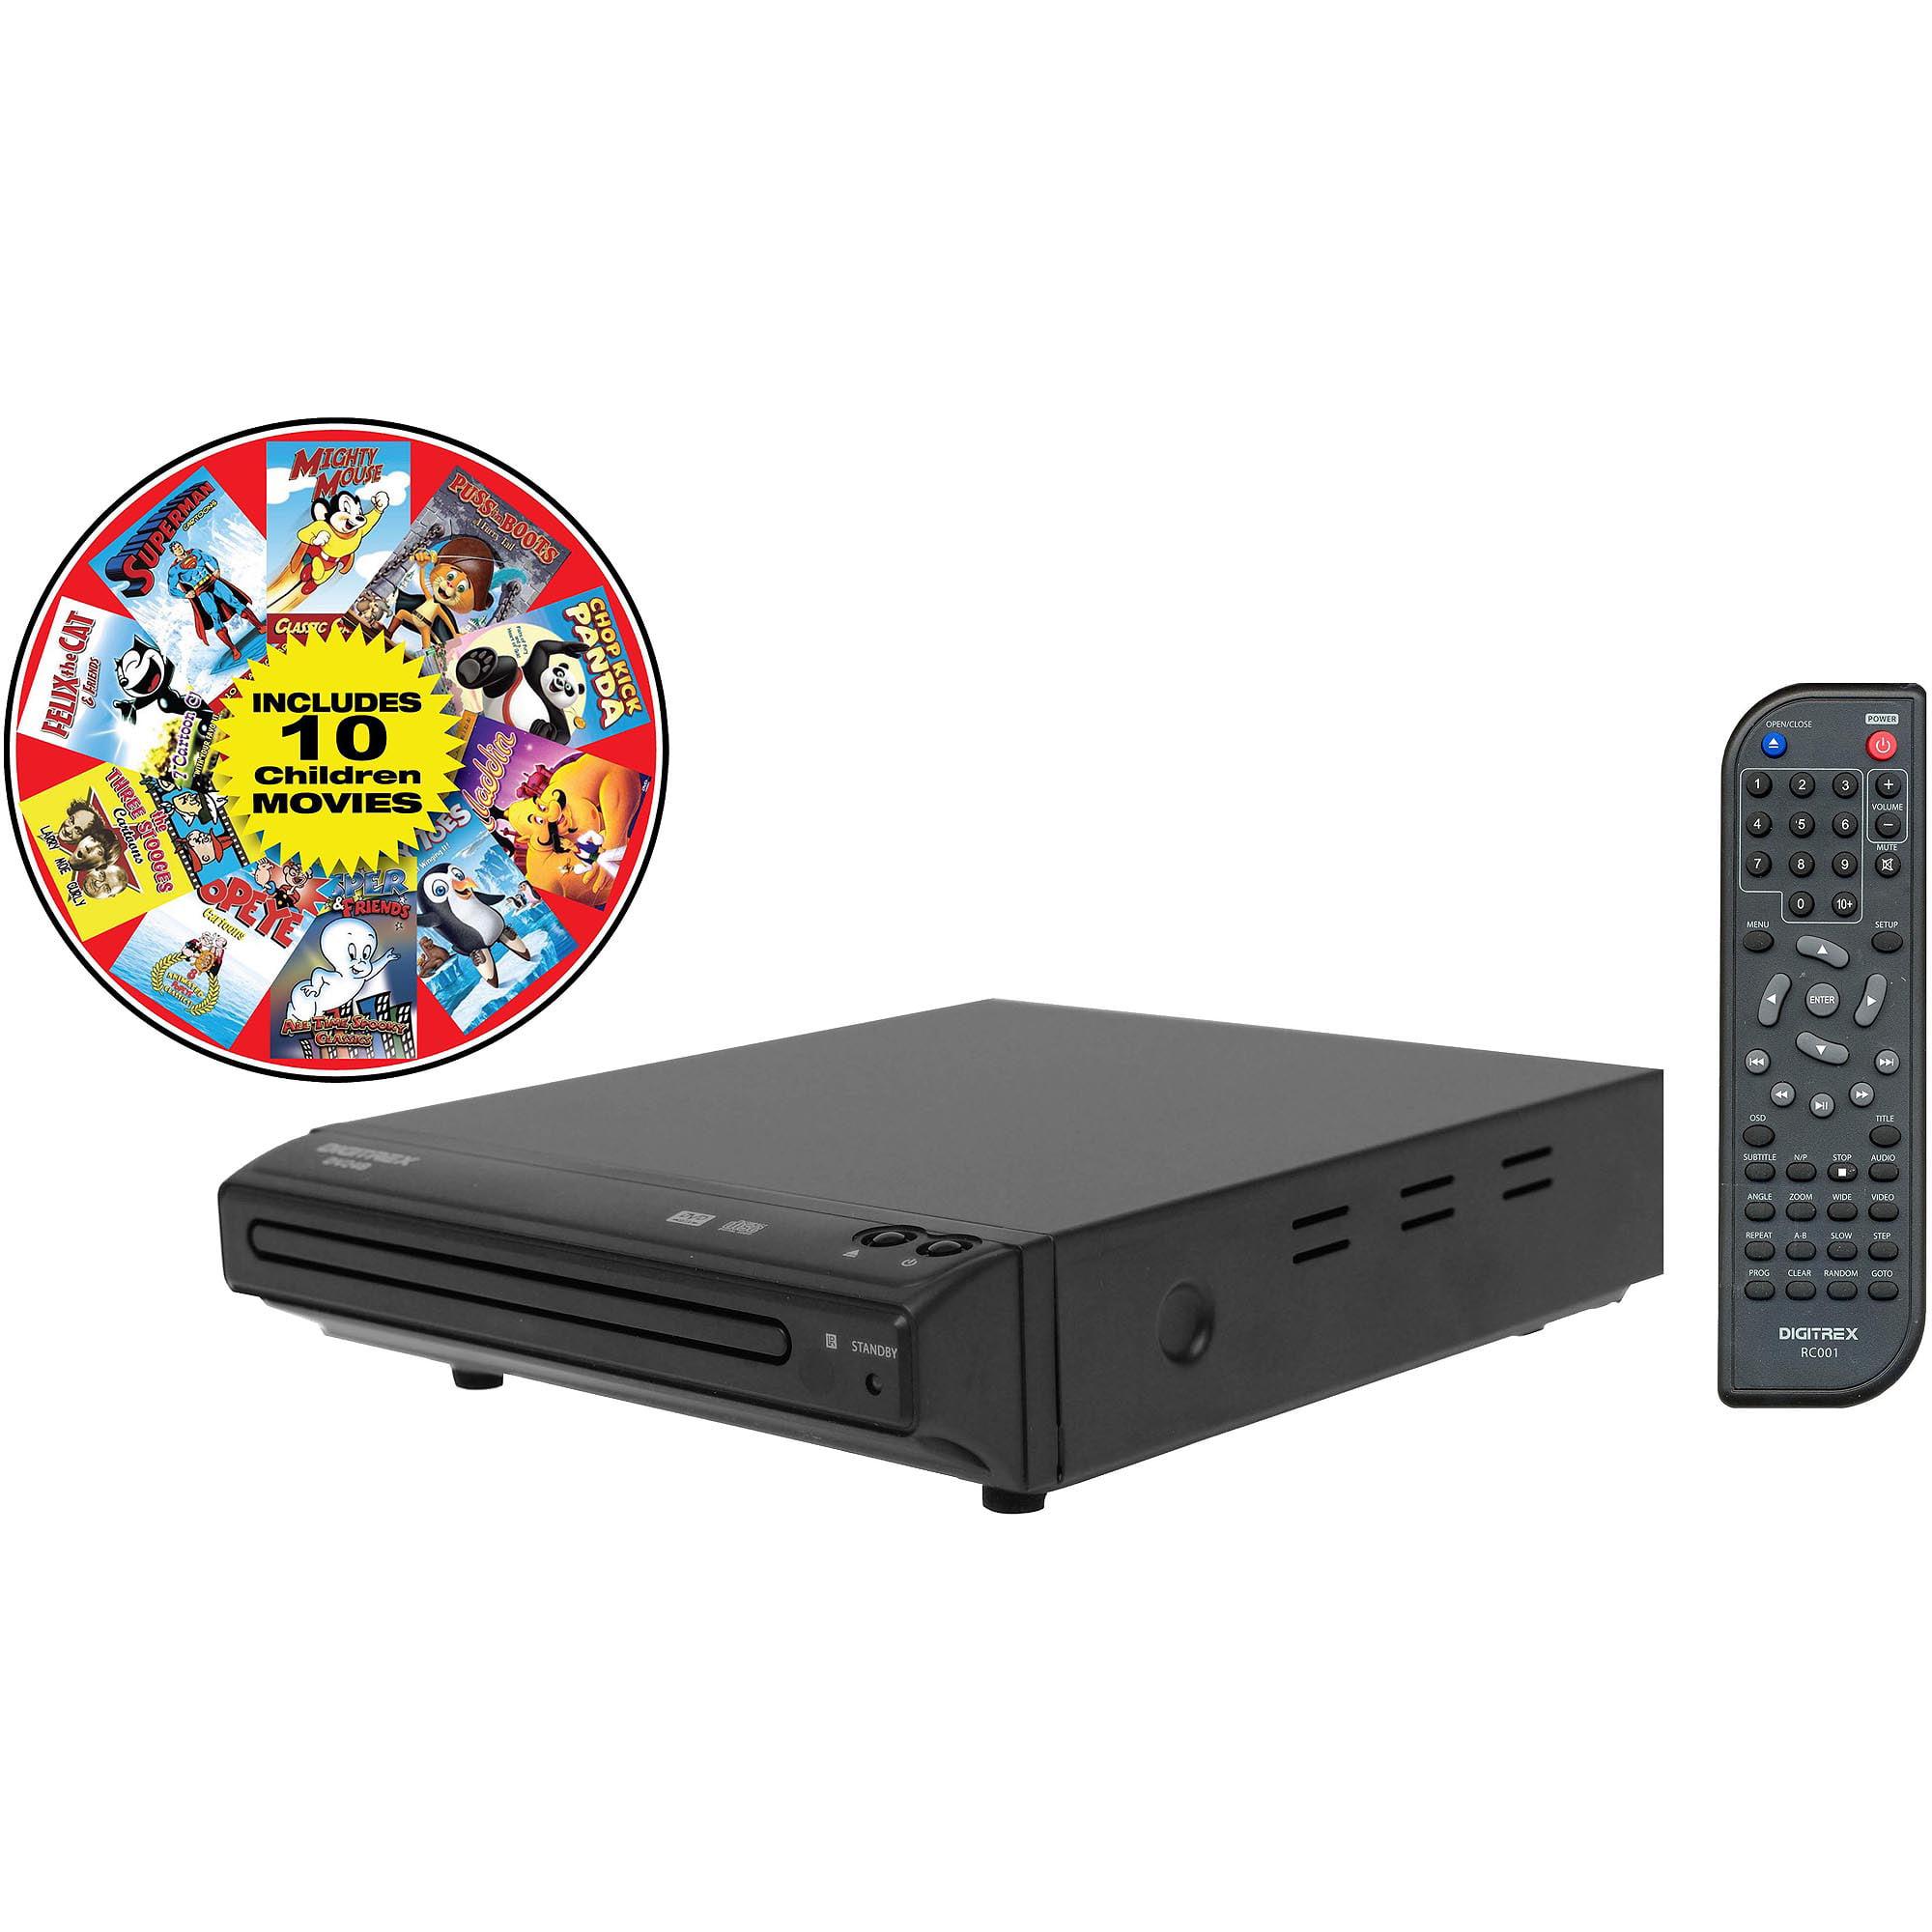 Digitrex DV24B DVD Player Bundle with 10 Free Movies